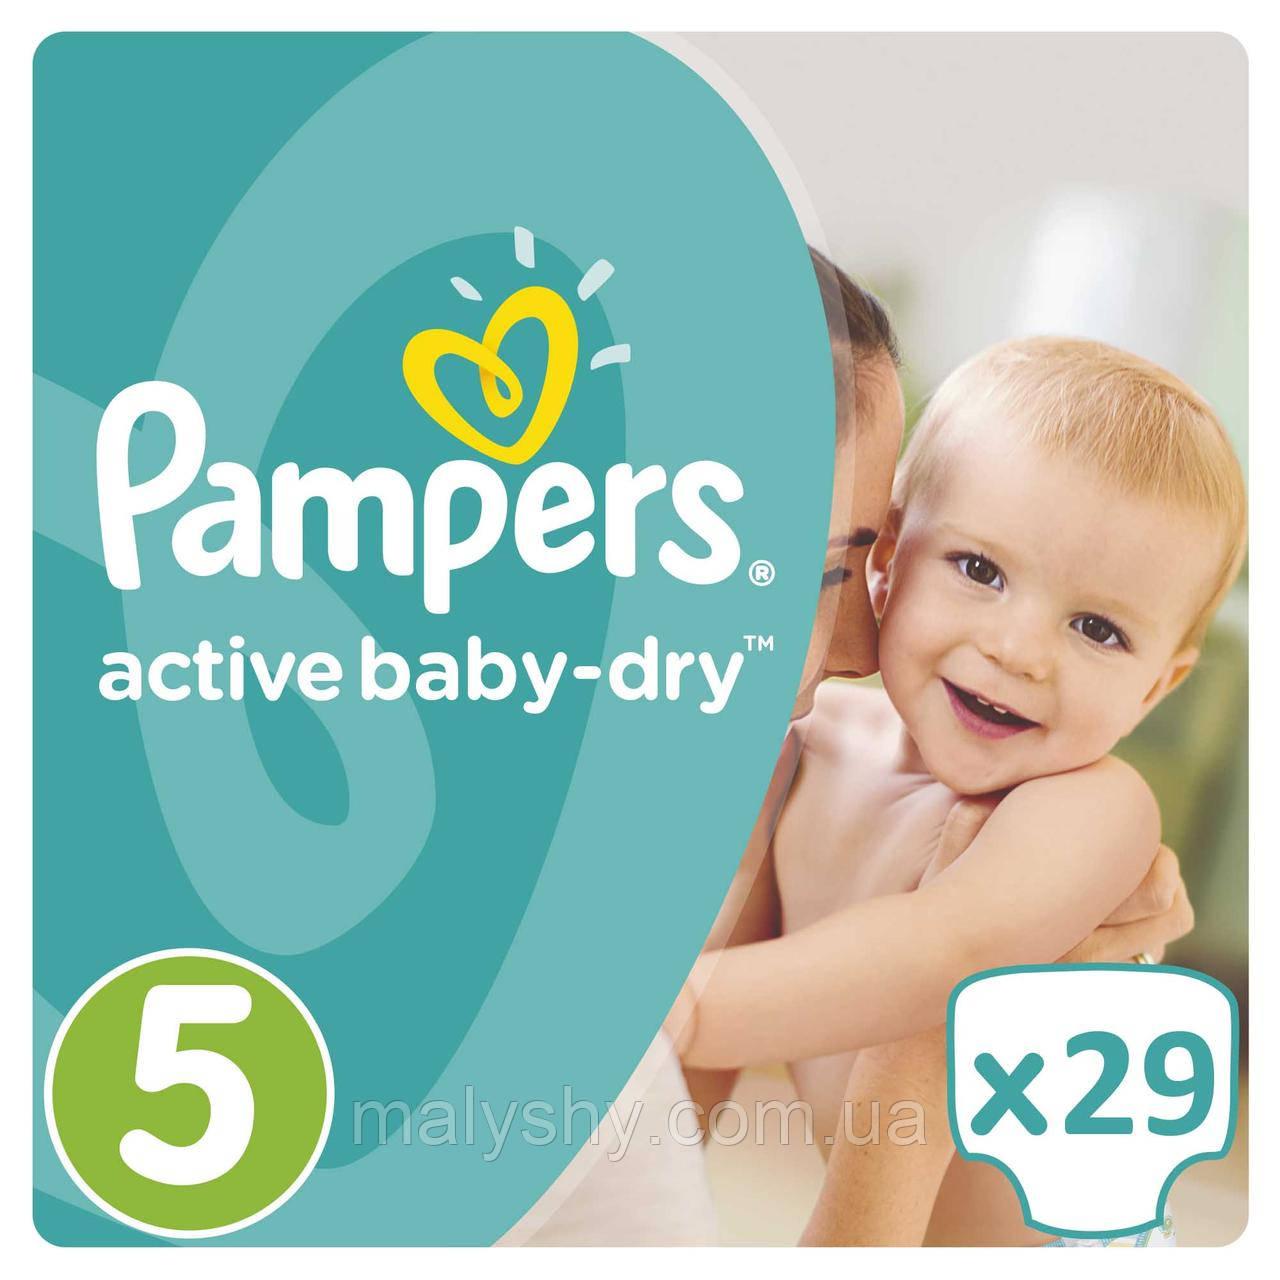 257ca1532998 Подгузники Pampers Active Baby-Dry Размер 5 (Junior) 11-18 кг, 29 ...